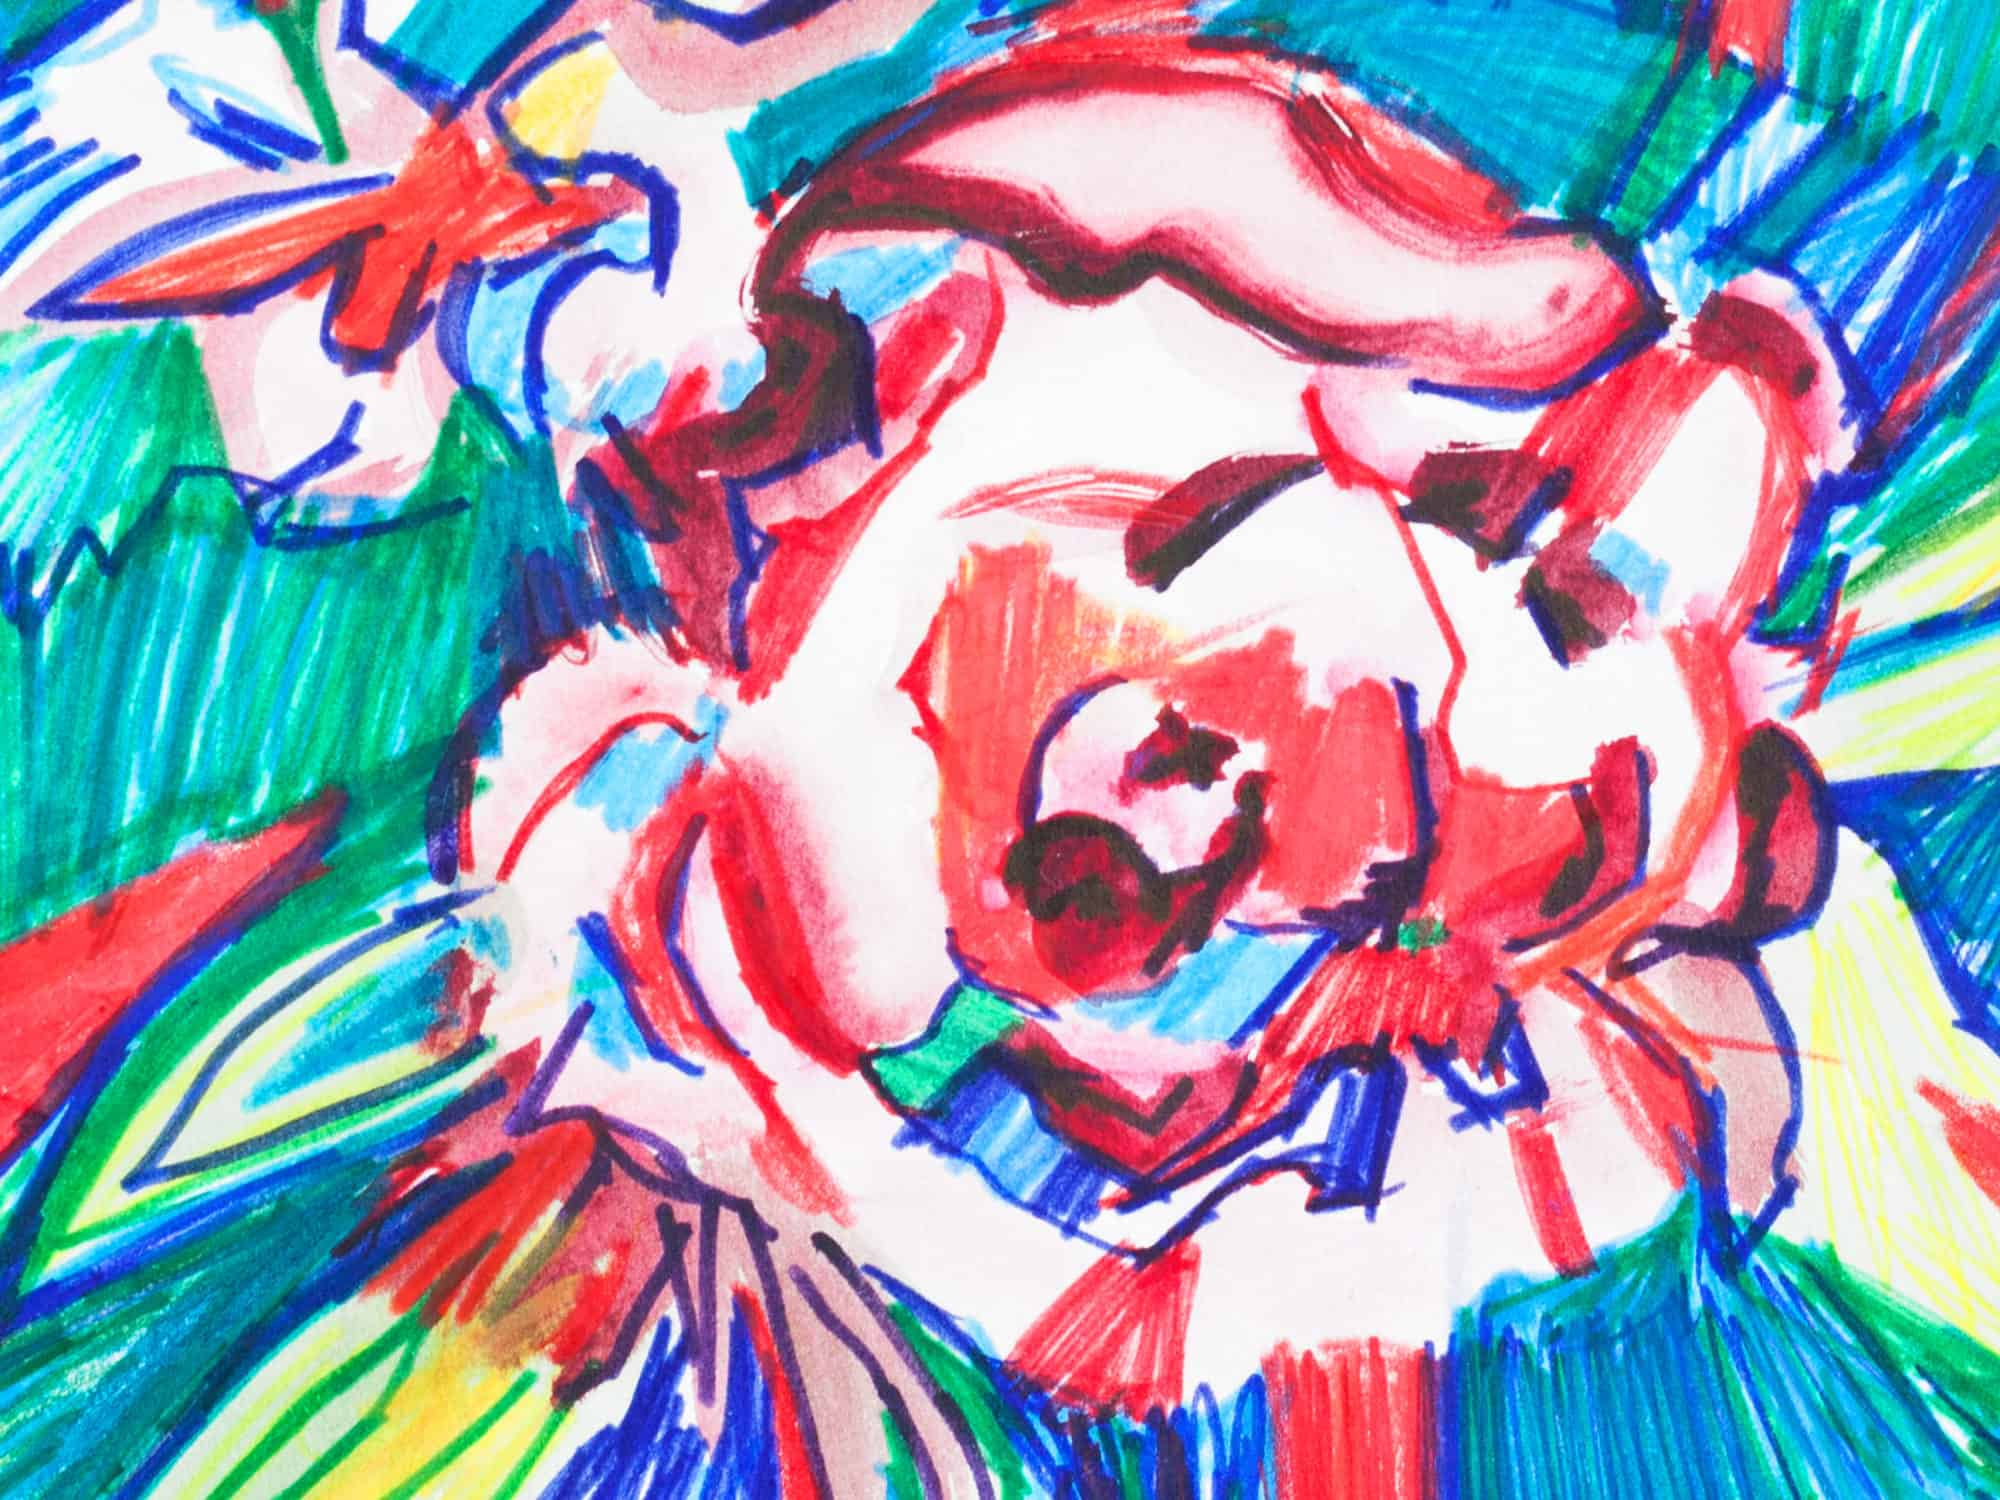 Modernes Acryl Gemälde abstrakte Blume